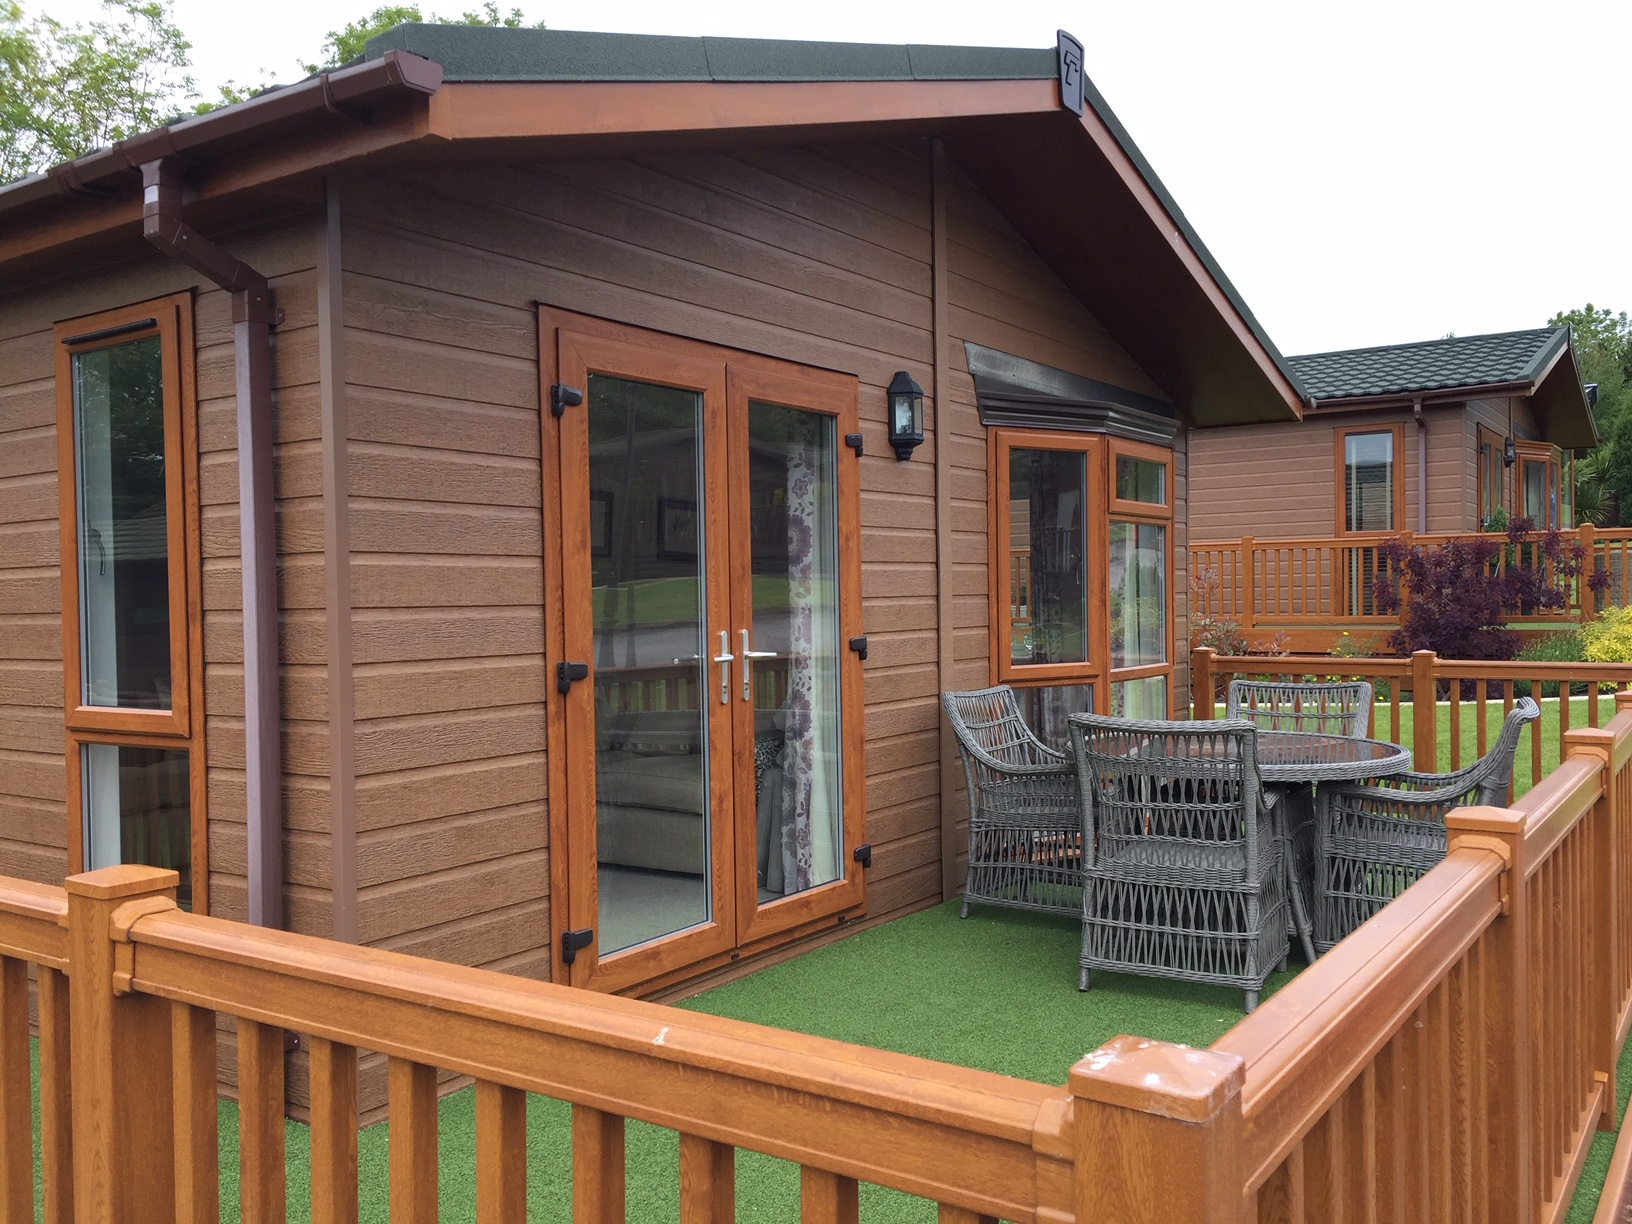 Tingdene Lodge